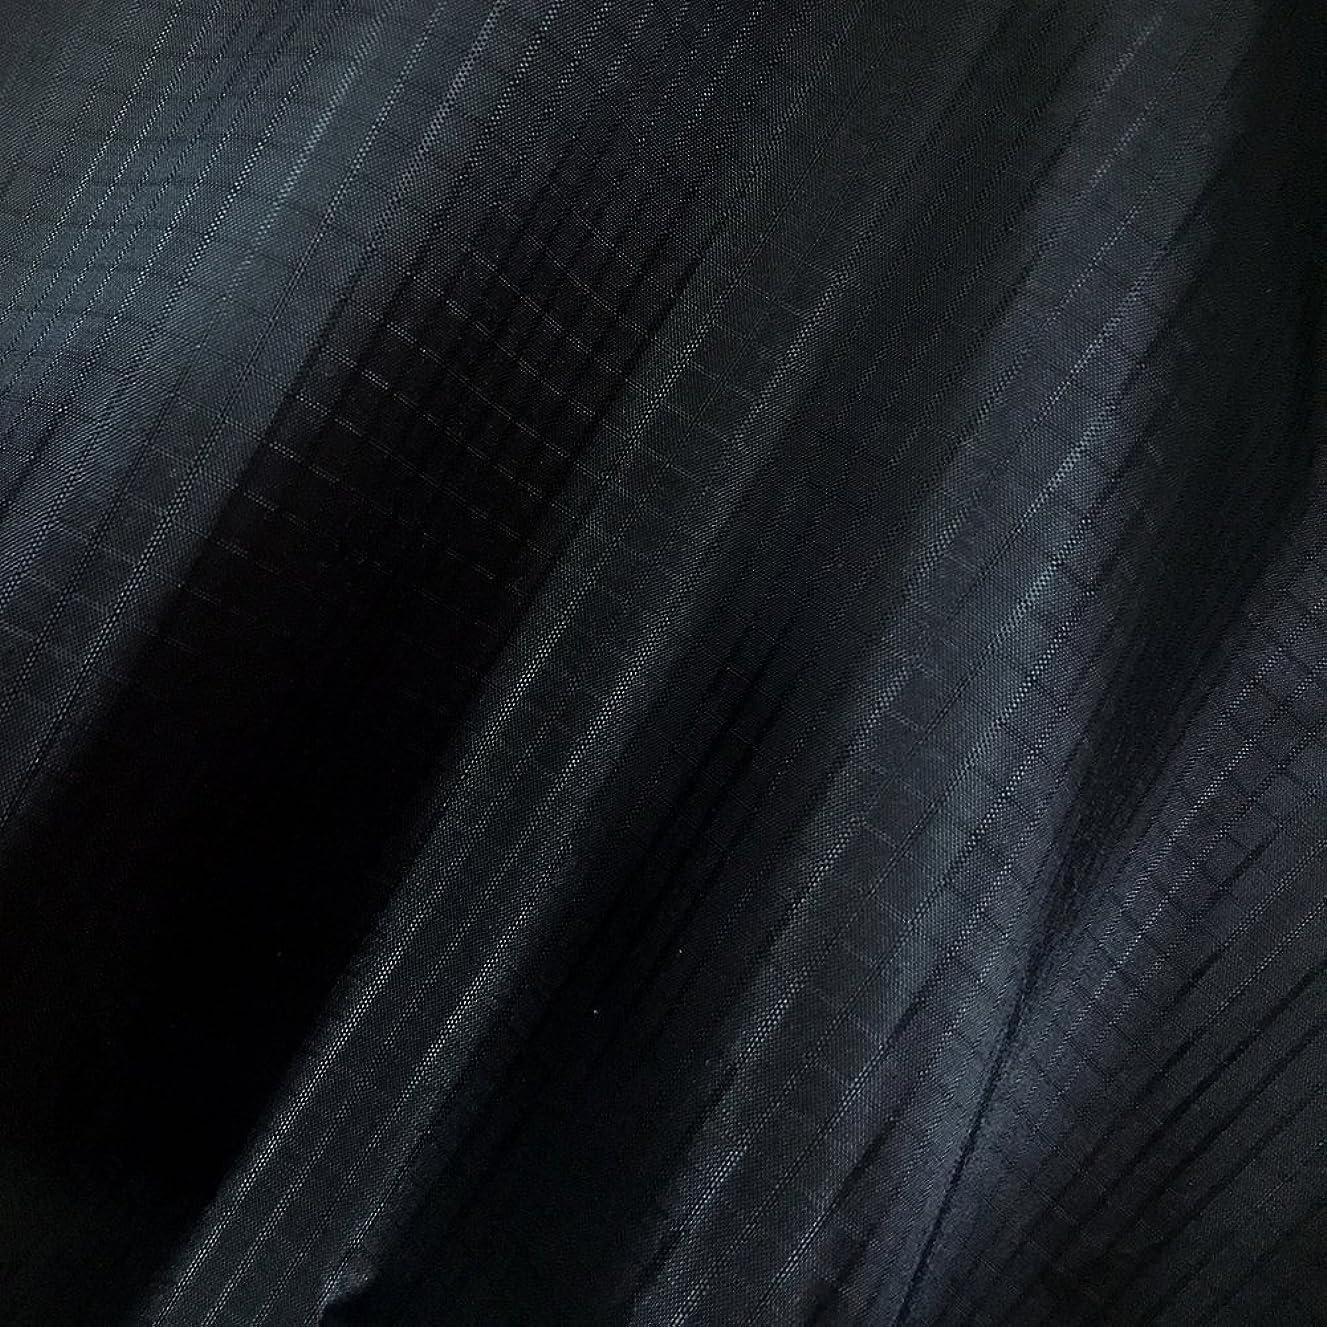 emma kites Black Ripstop Nylon Fabric 60